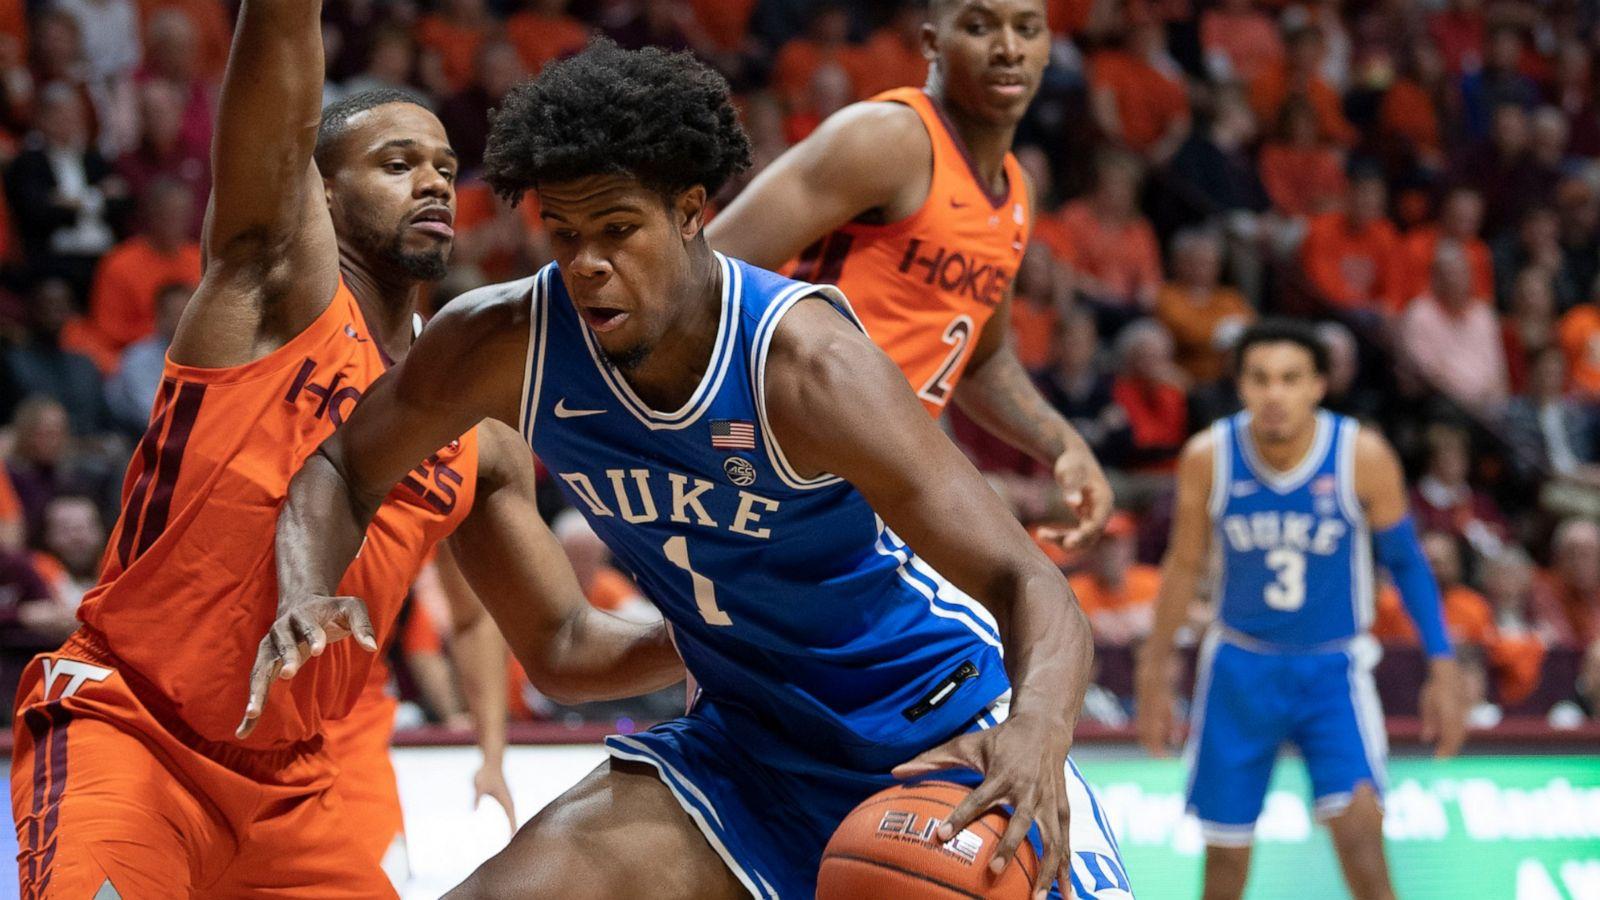 Duke Stumbles but Recovers at Virginia Tech 77-63; Tre Jones Scores 15; Duke Scores 35 Bench Points